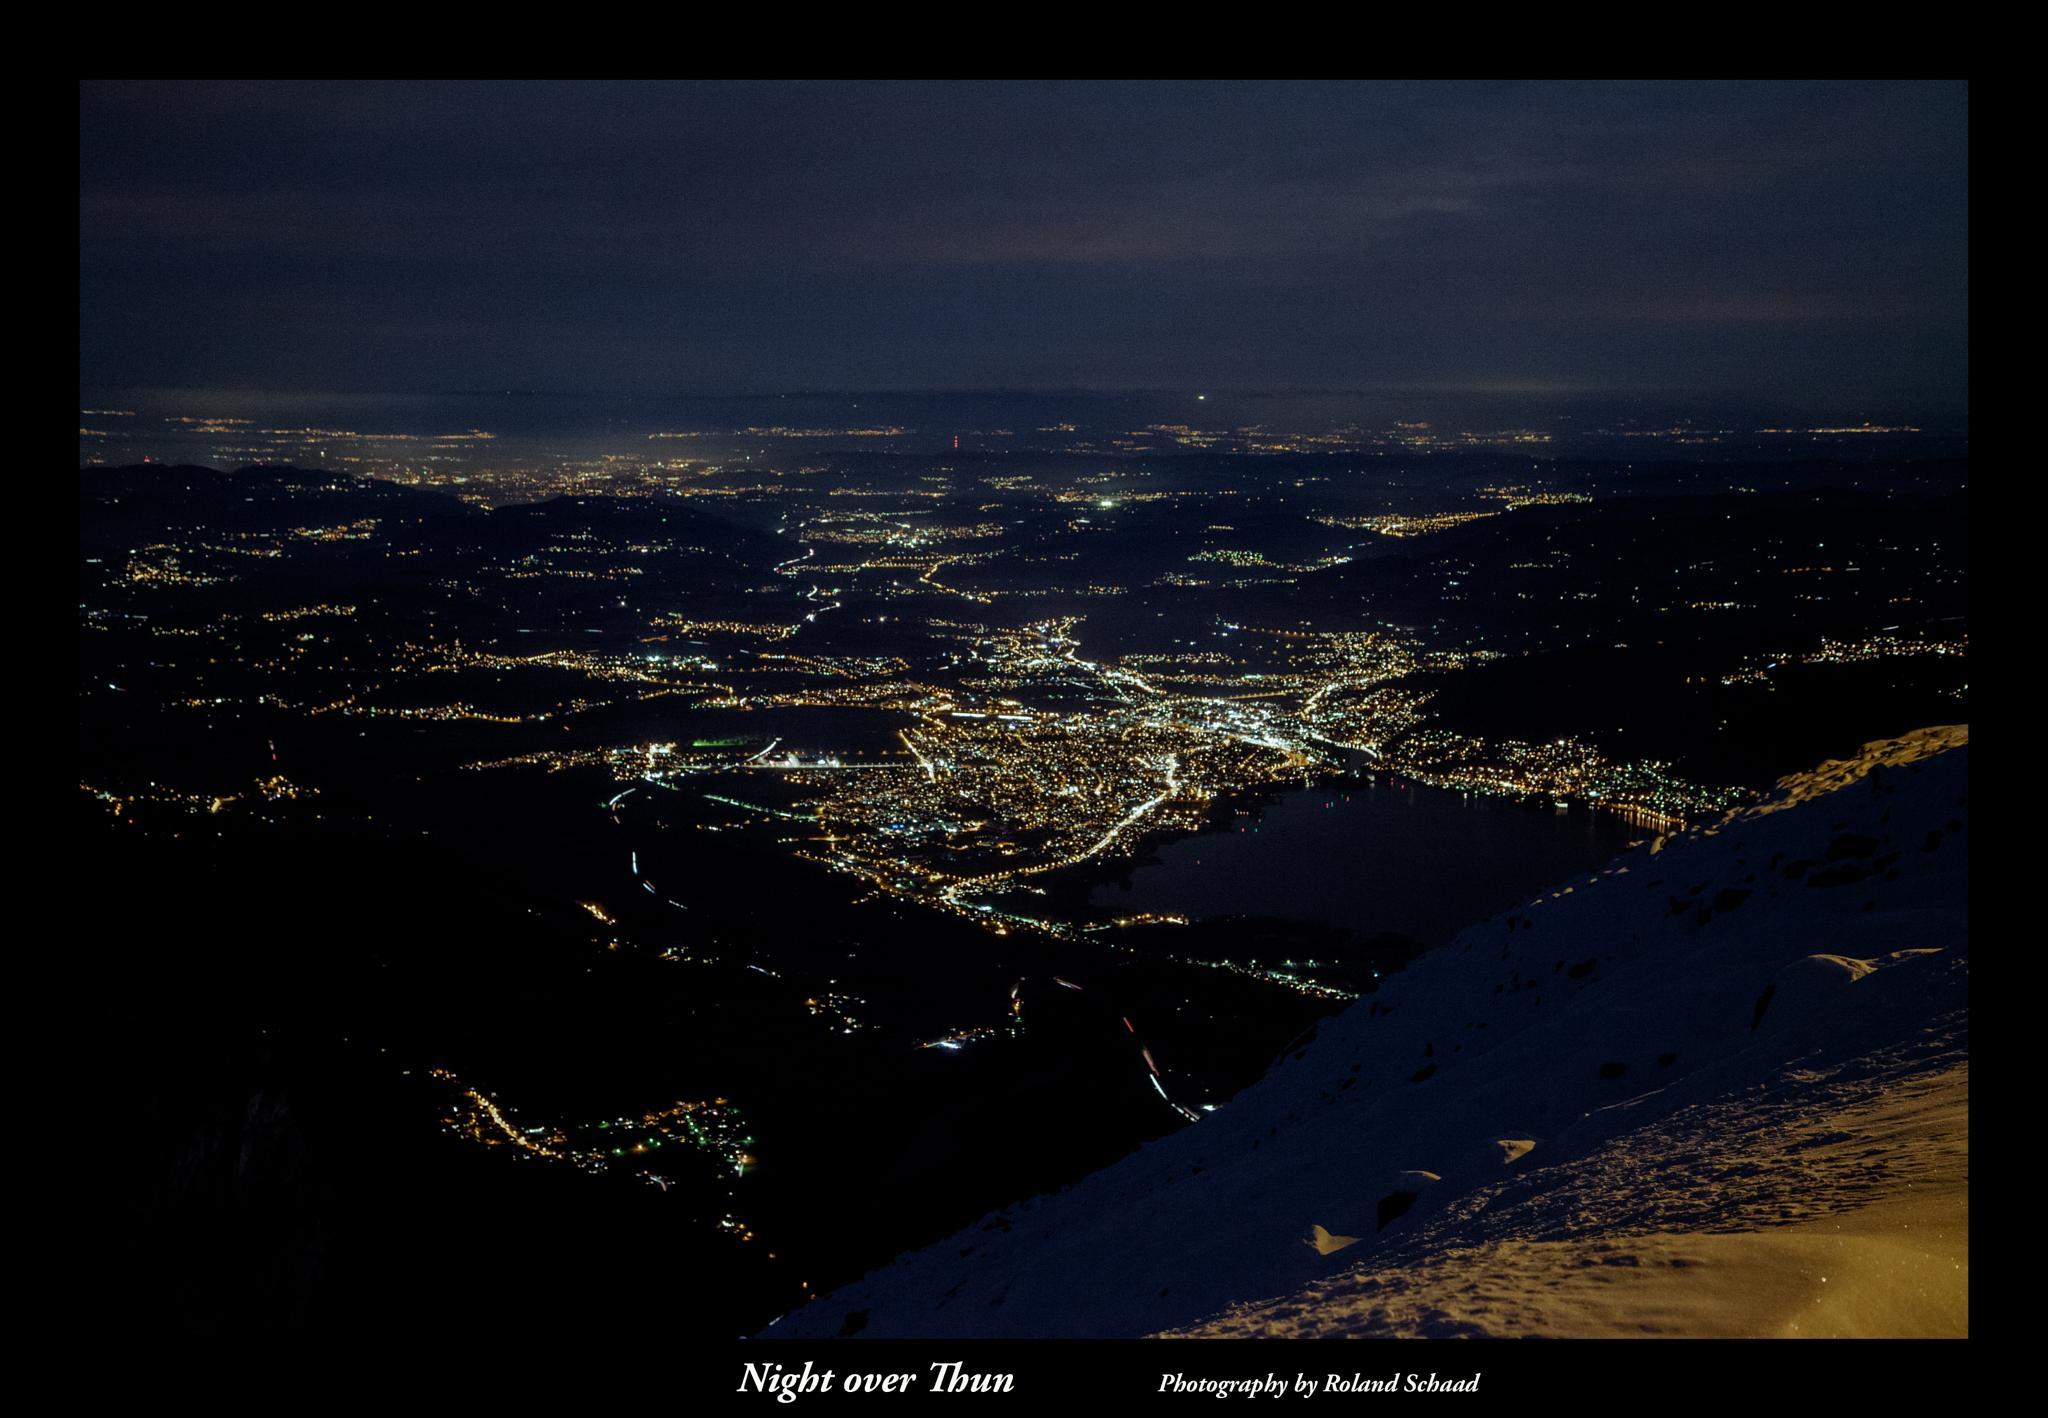 Night over Thun by Roland Schaad